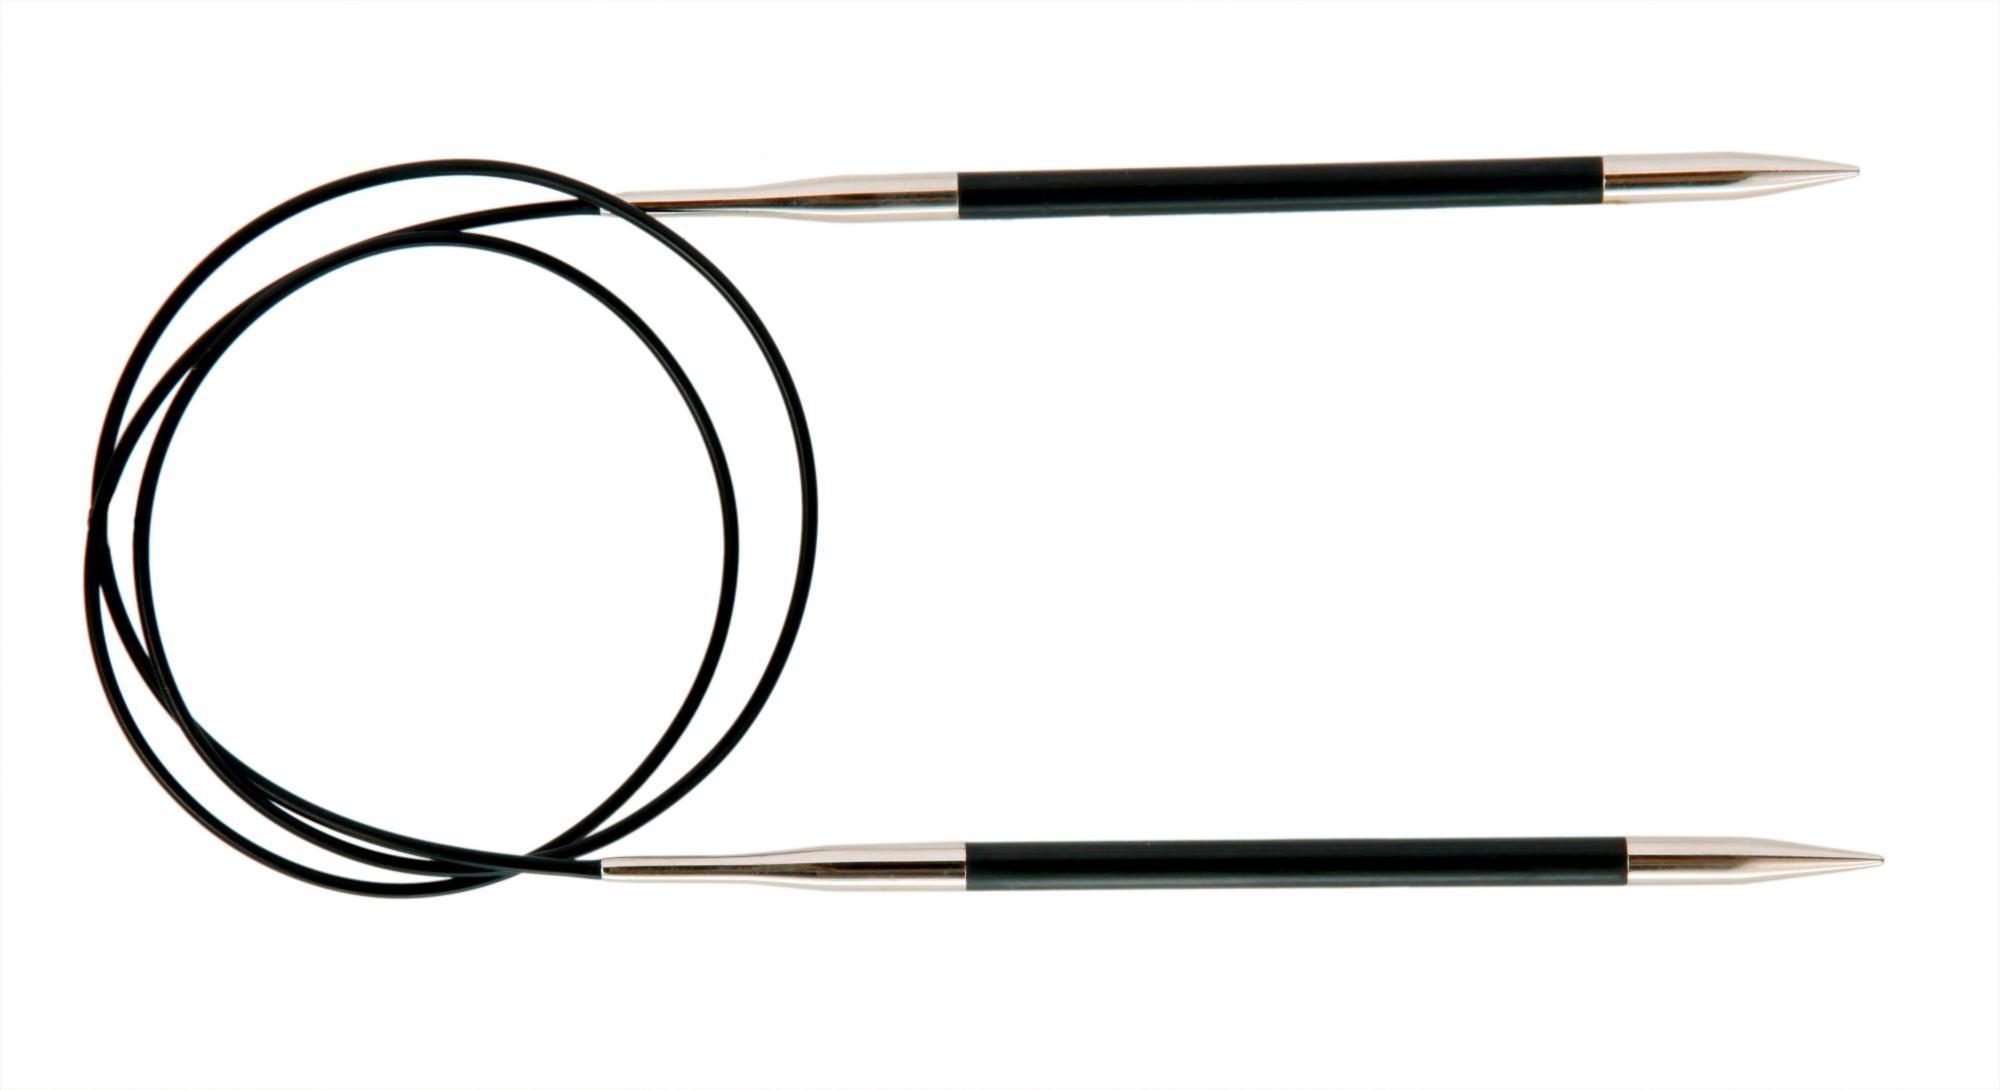 Спицы круговые 100 см Karbonz KnitPro, 41206, 3.25 мм